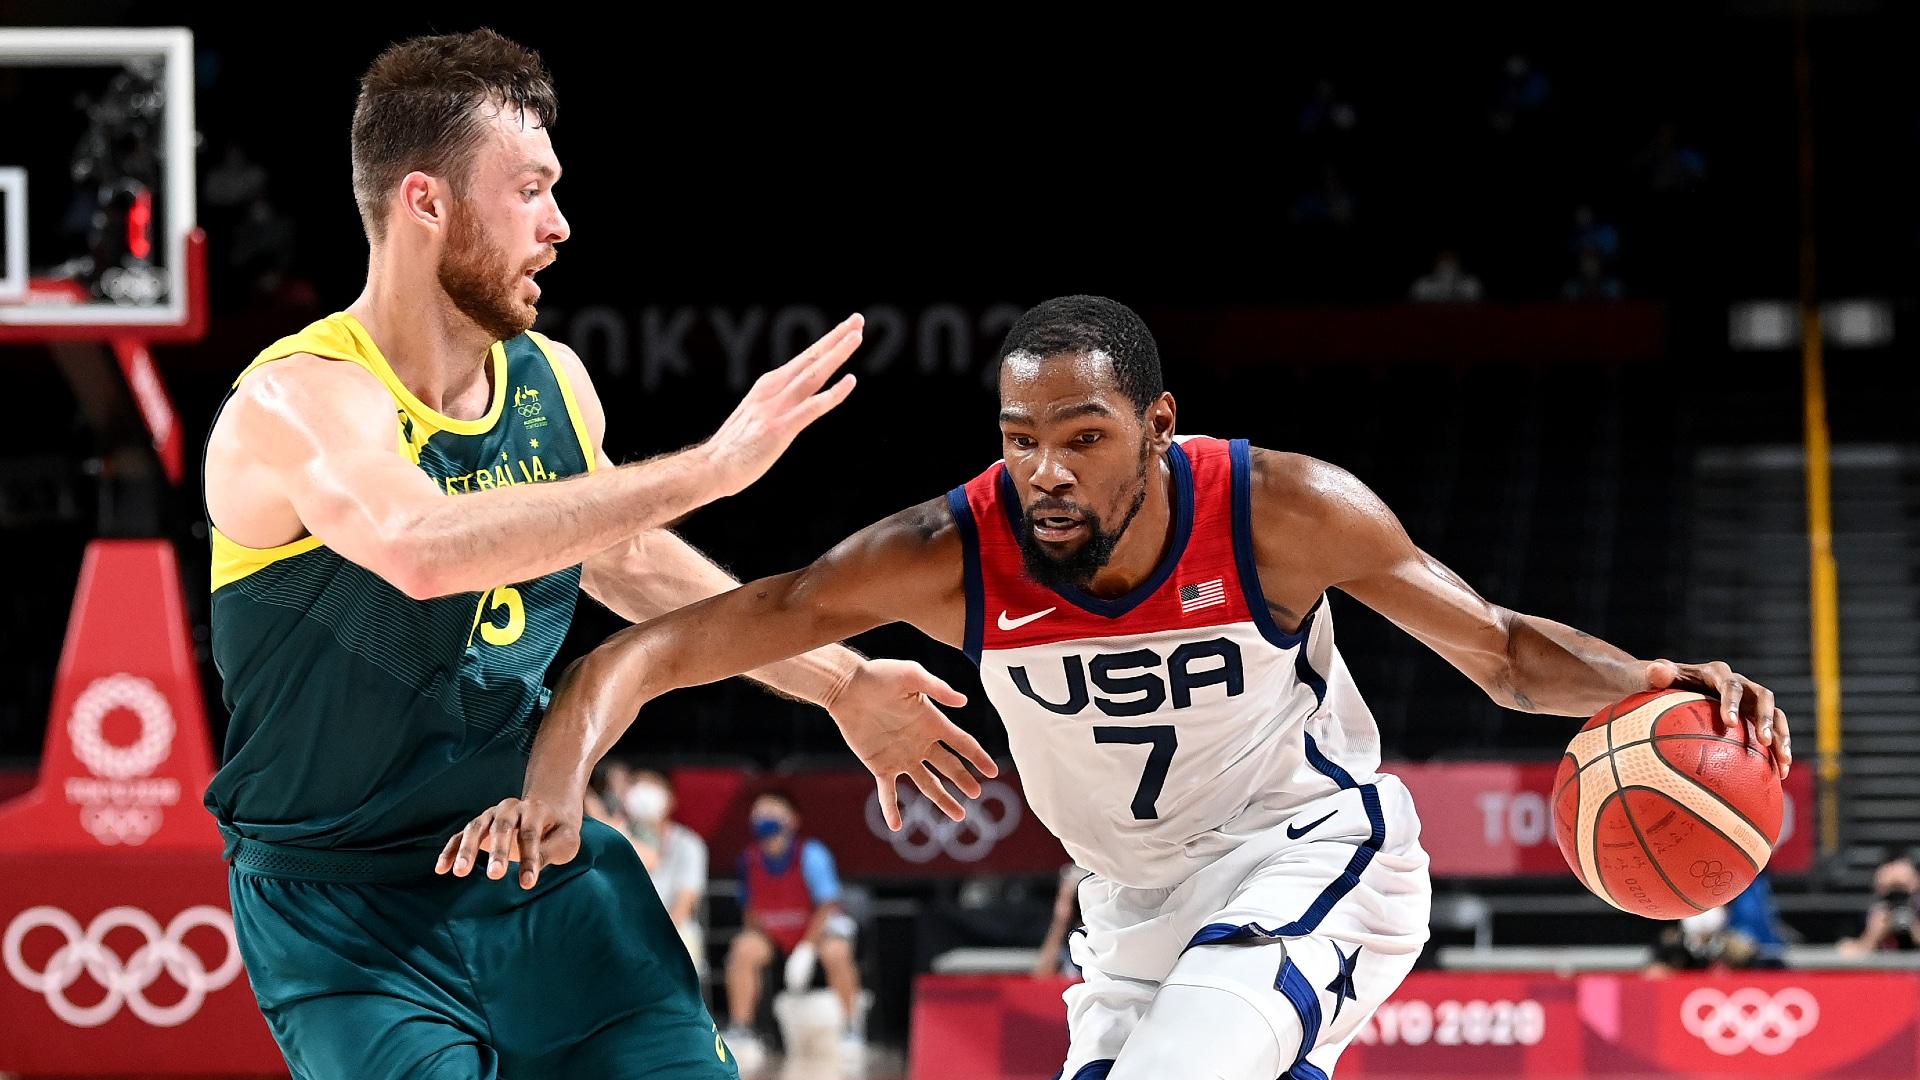 Olympic men's basketball recap: Team USA tops Australia, reaches gold medal game